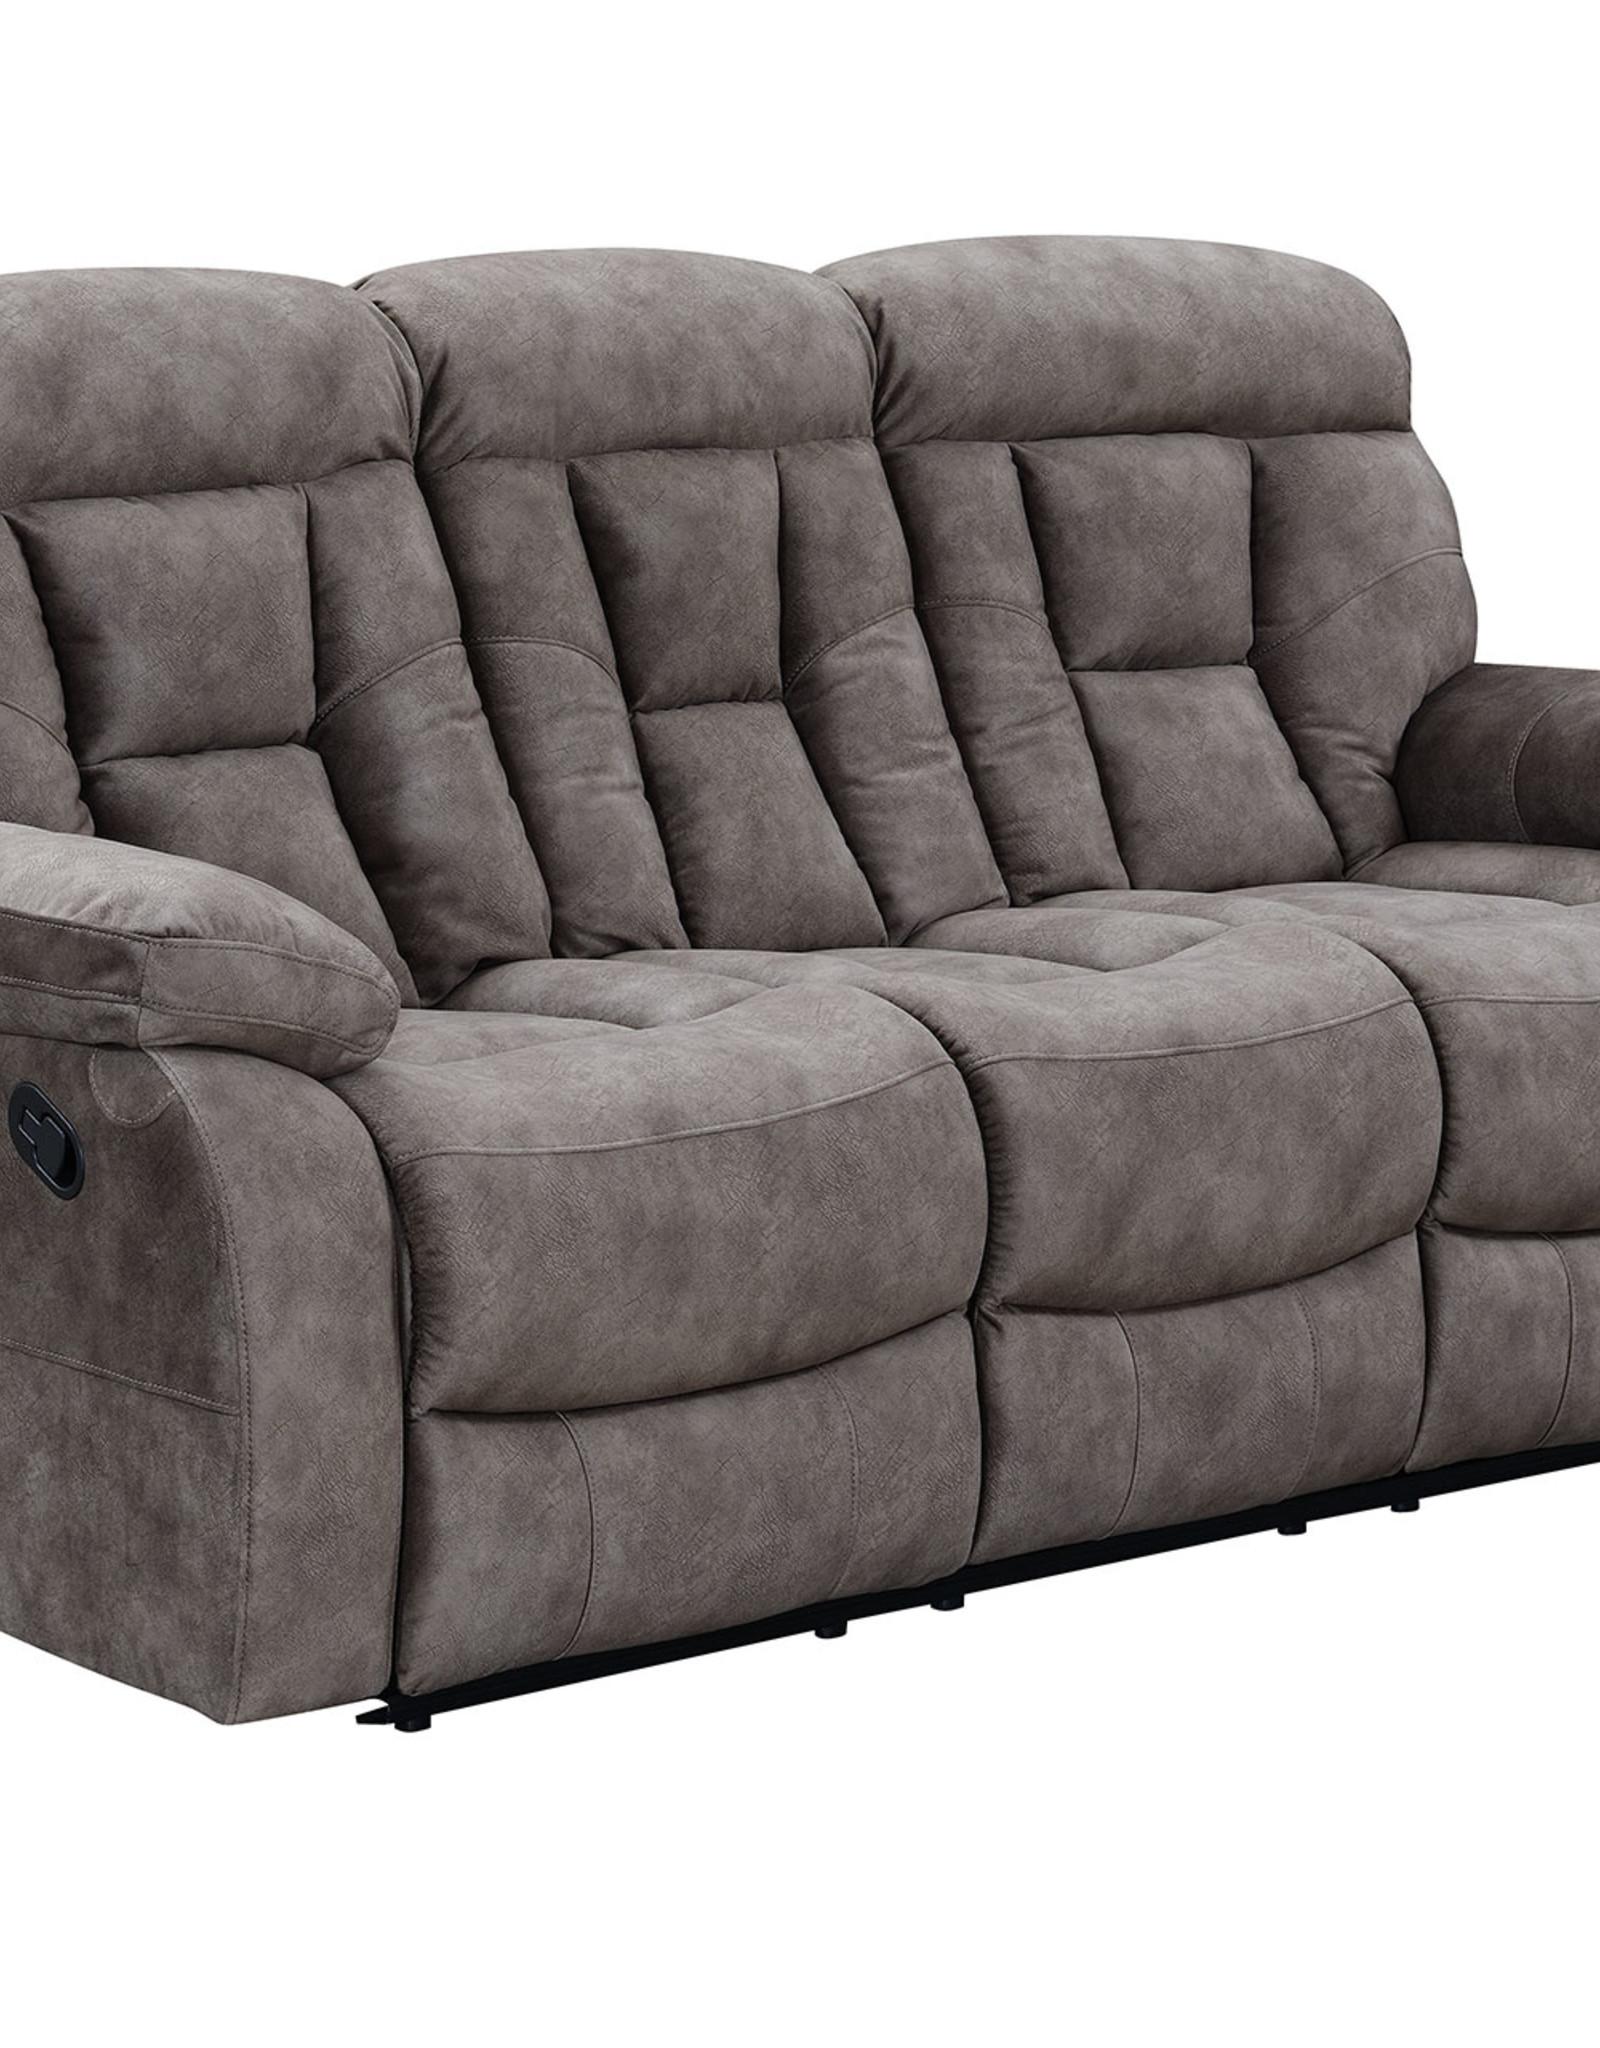 Steve Silver Bogata Reclining Sofa